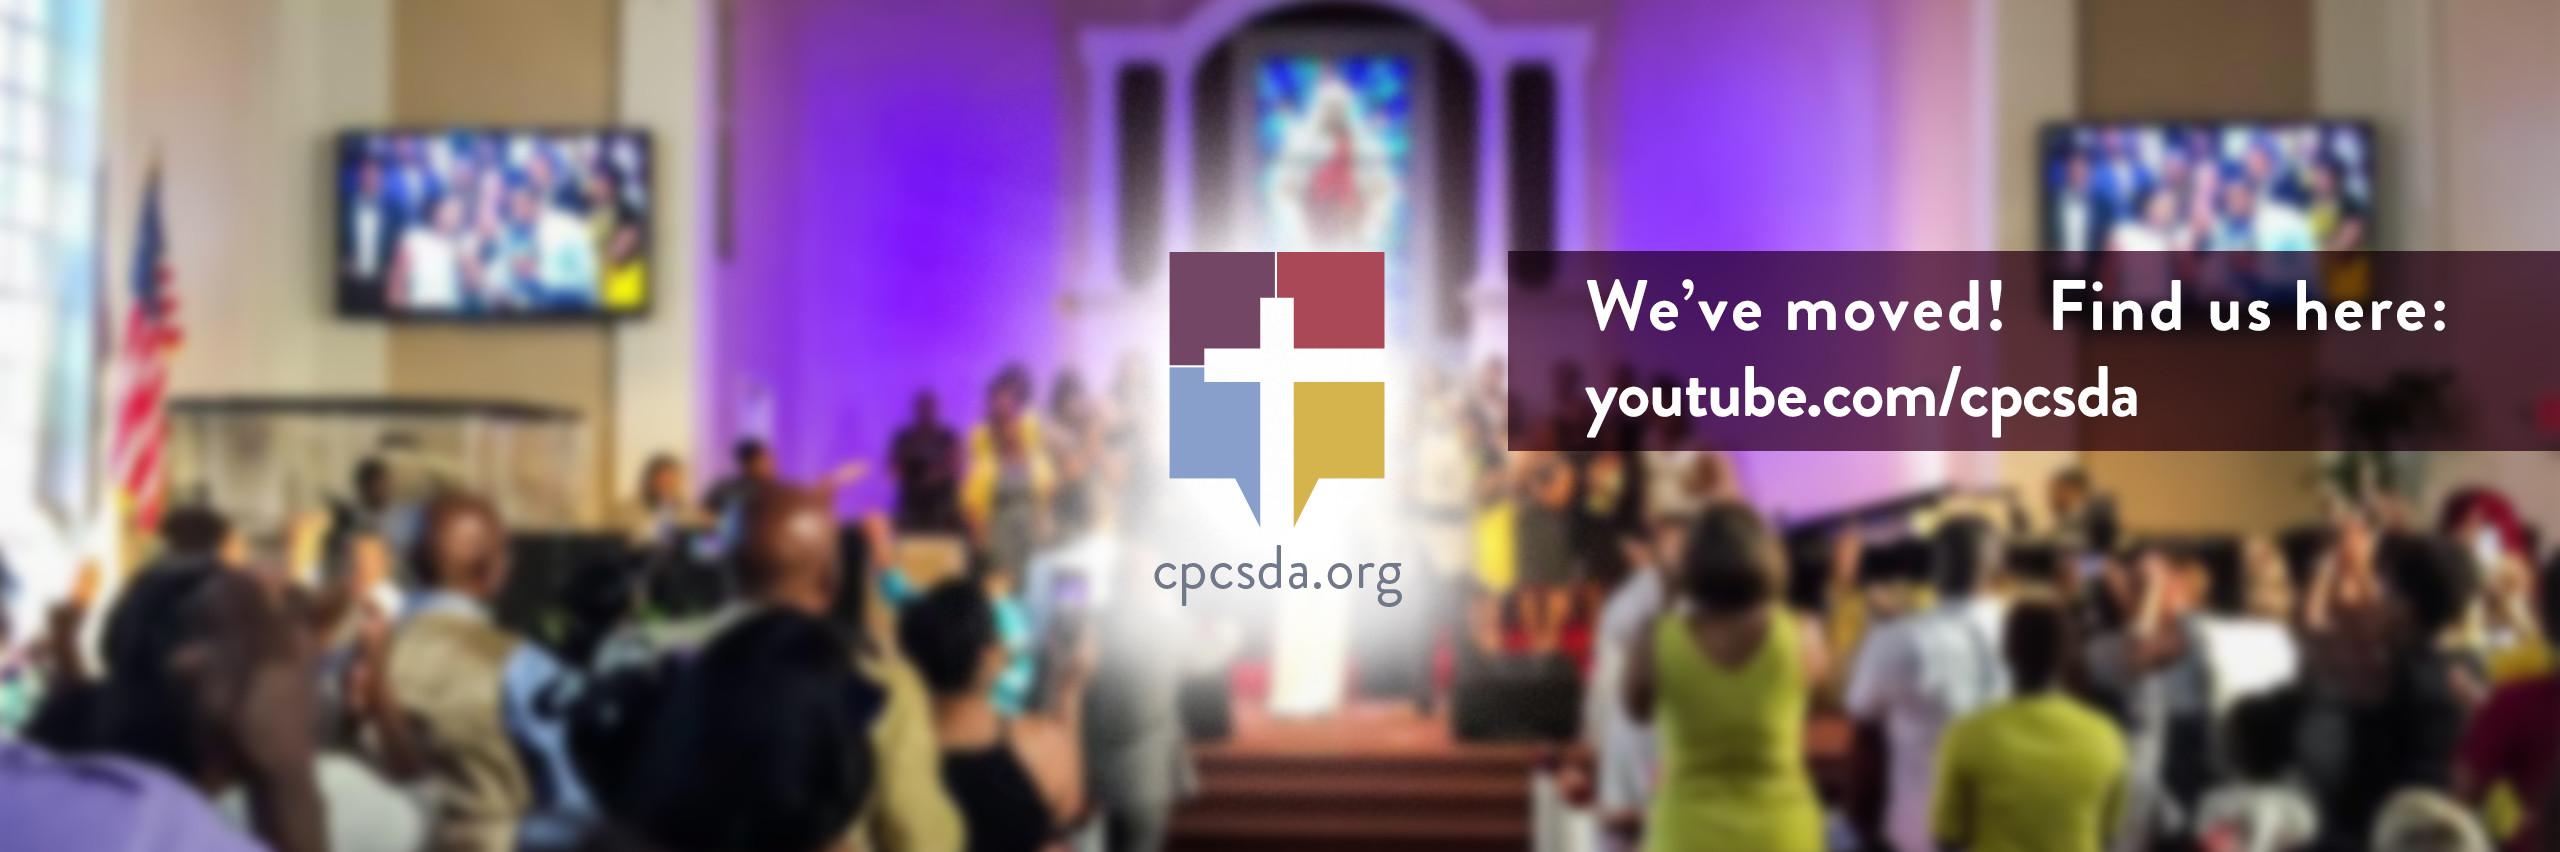 Community Praise Church of Seventh-day Adventists